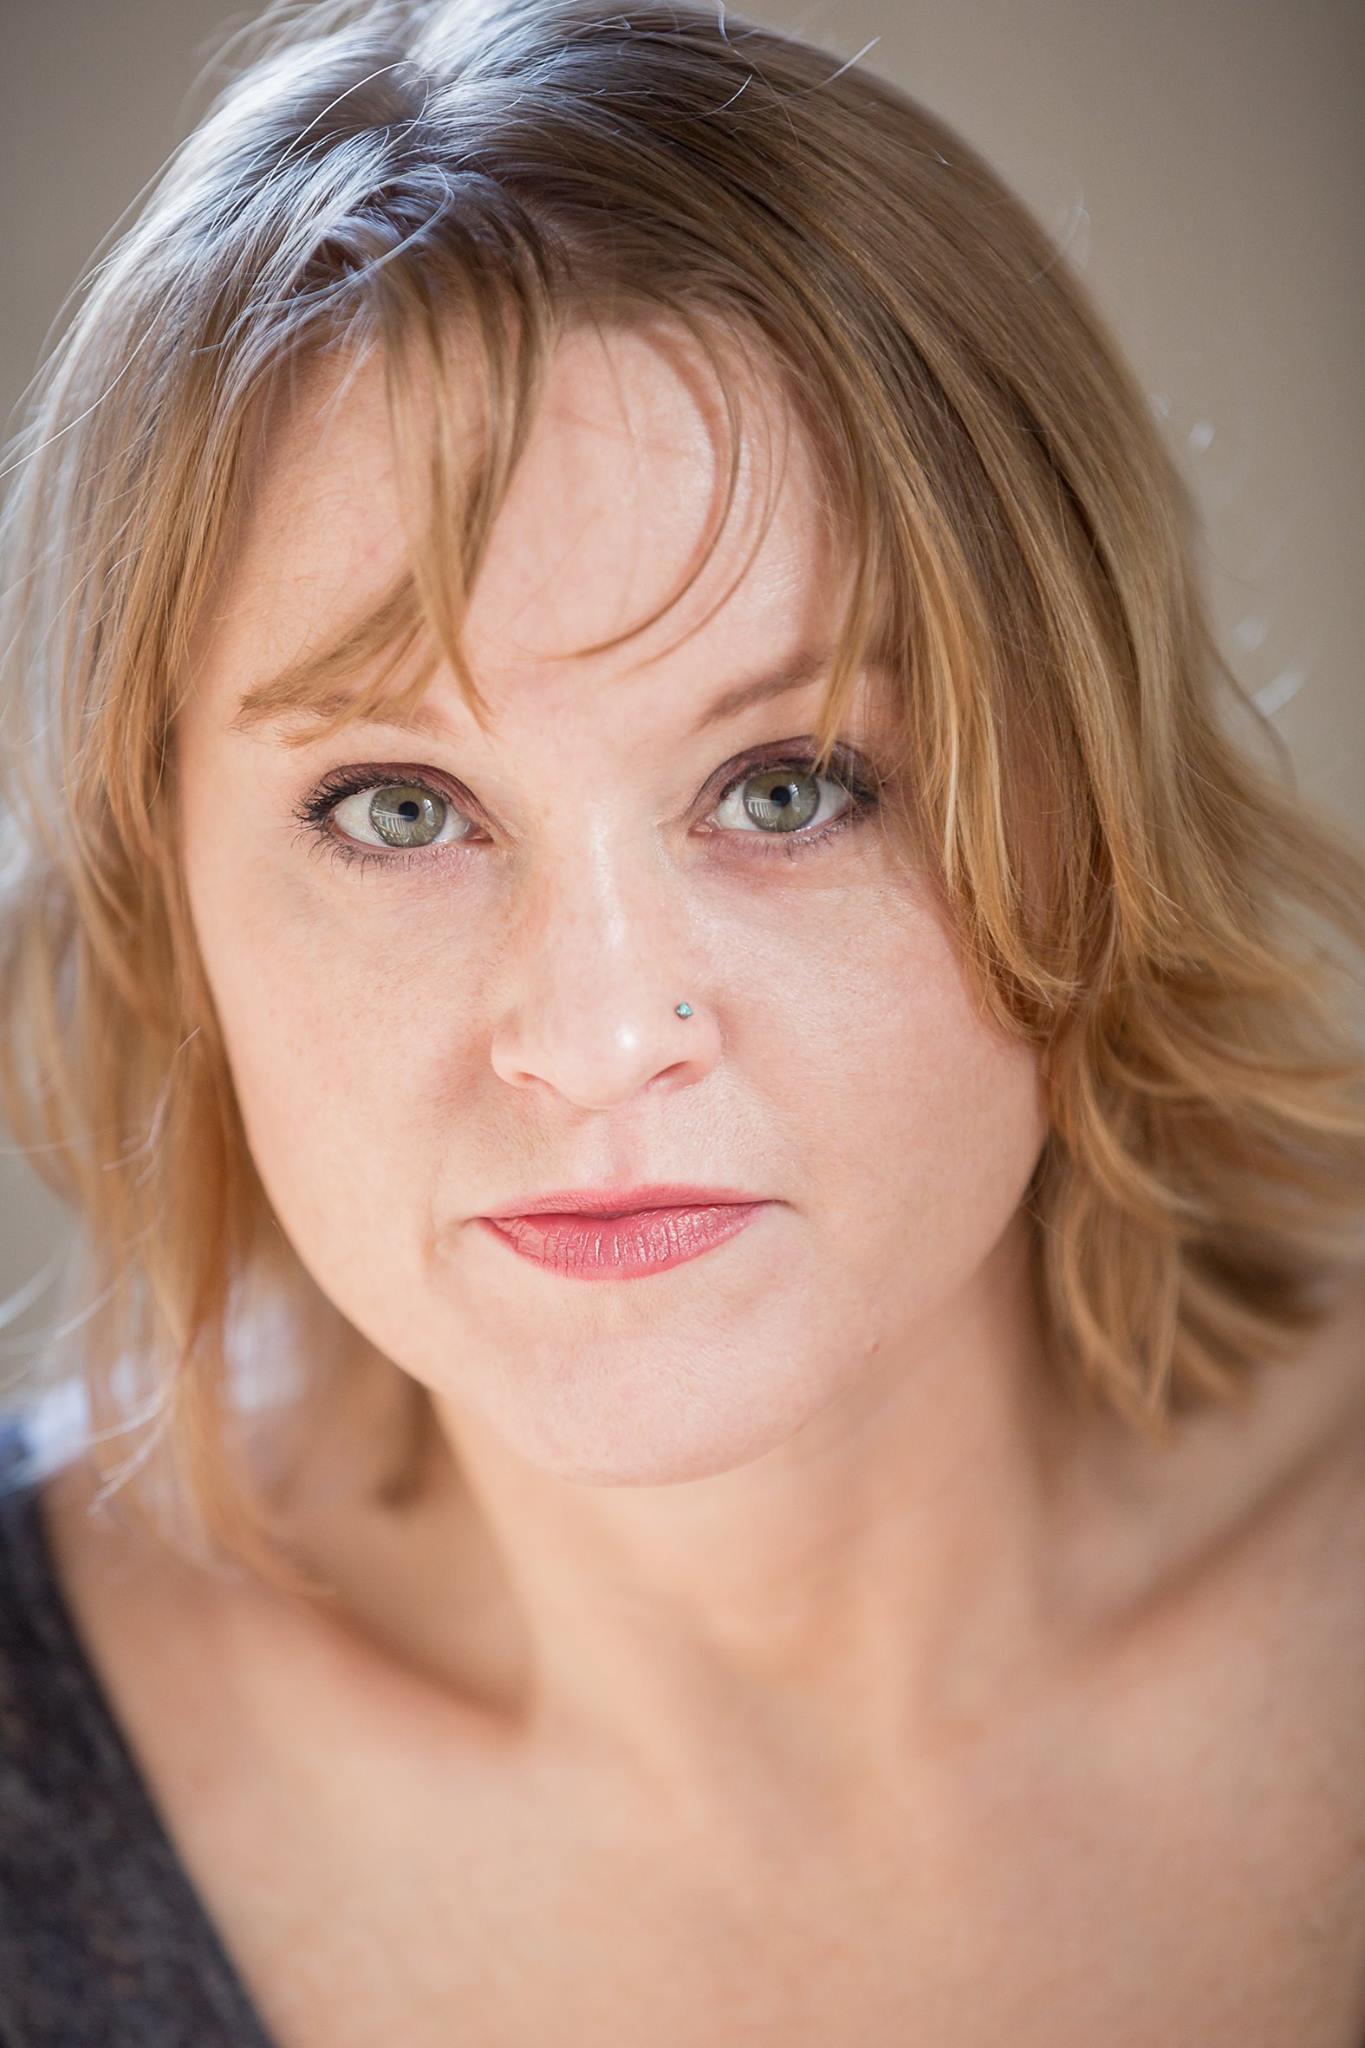 Tara Spires (she/her/hers)